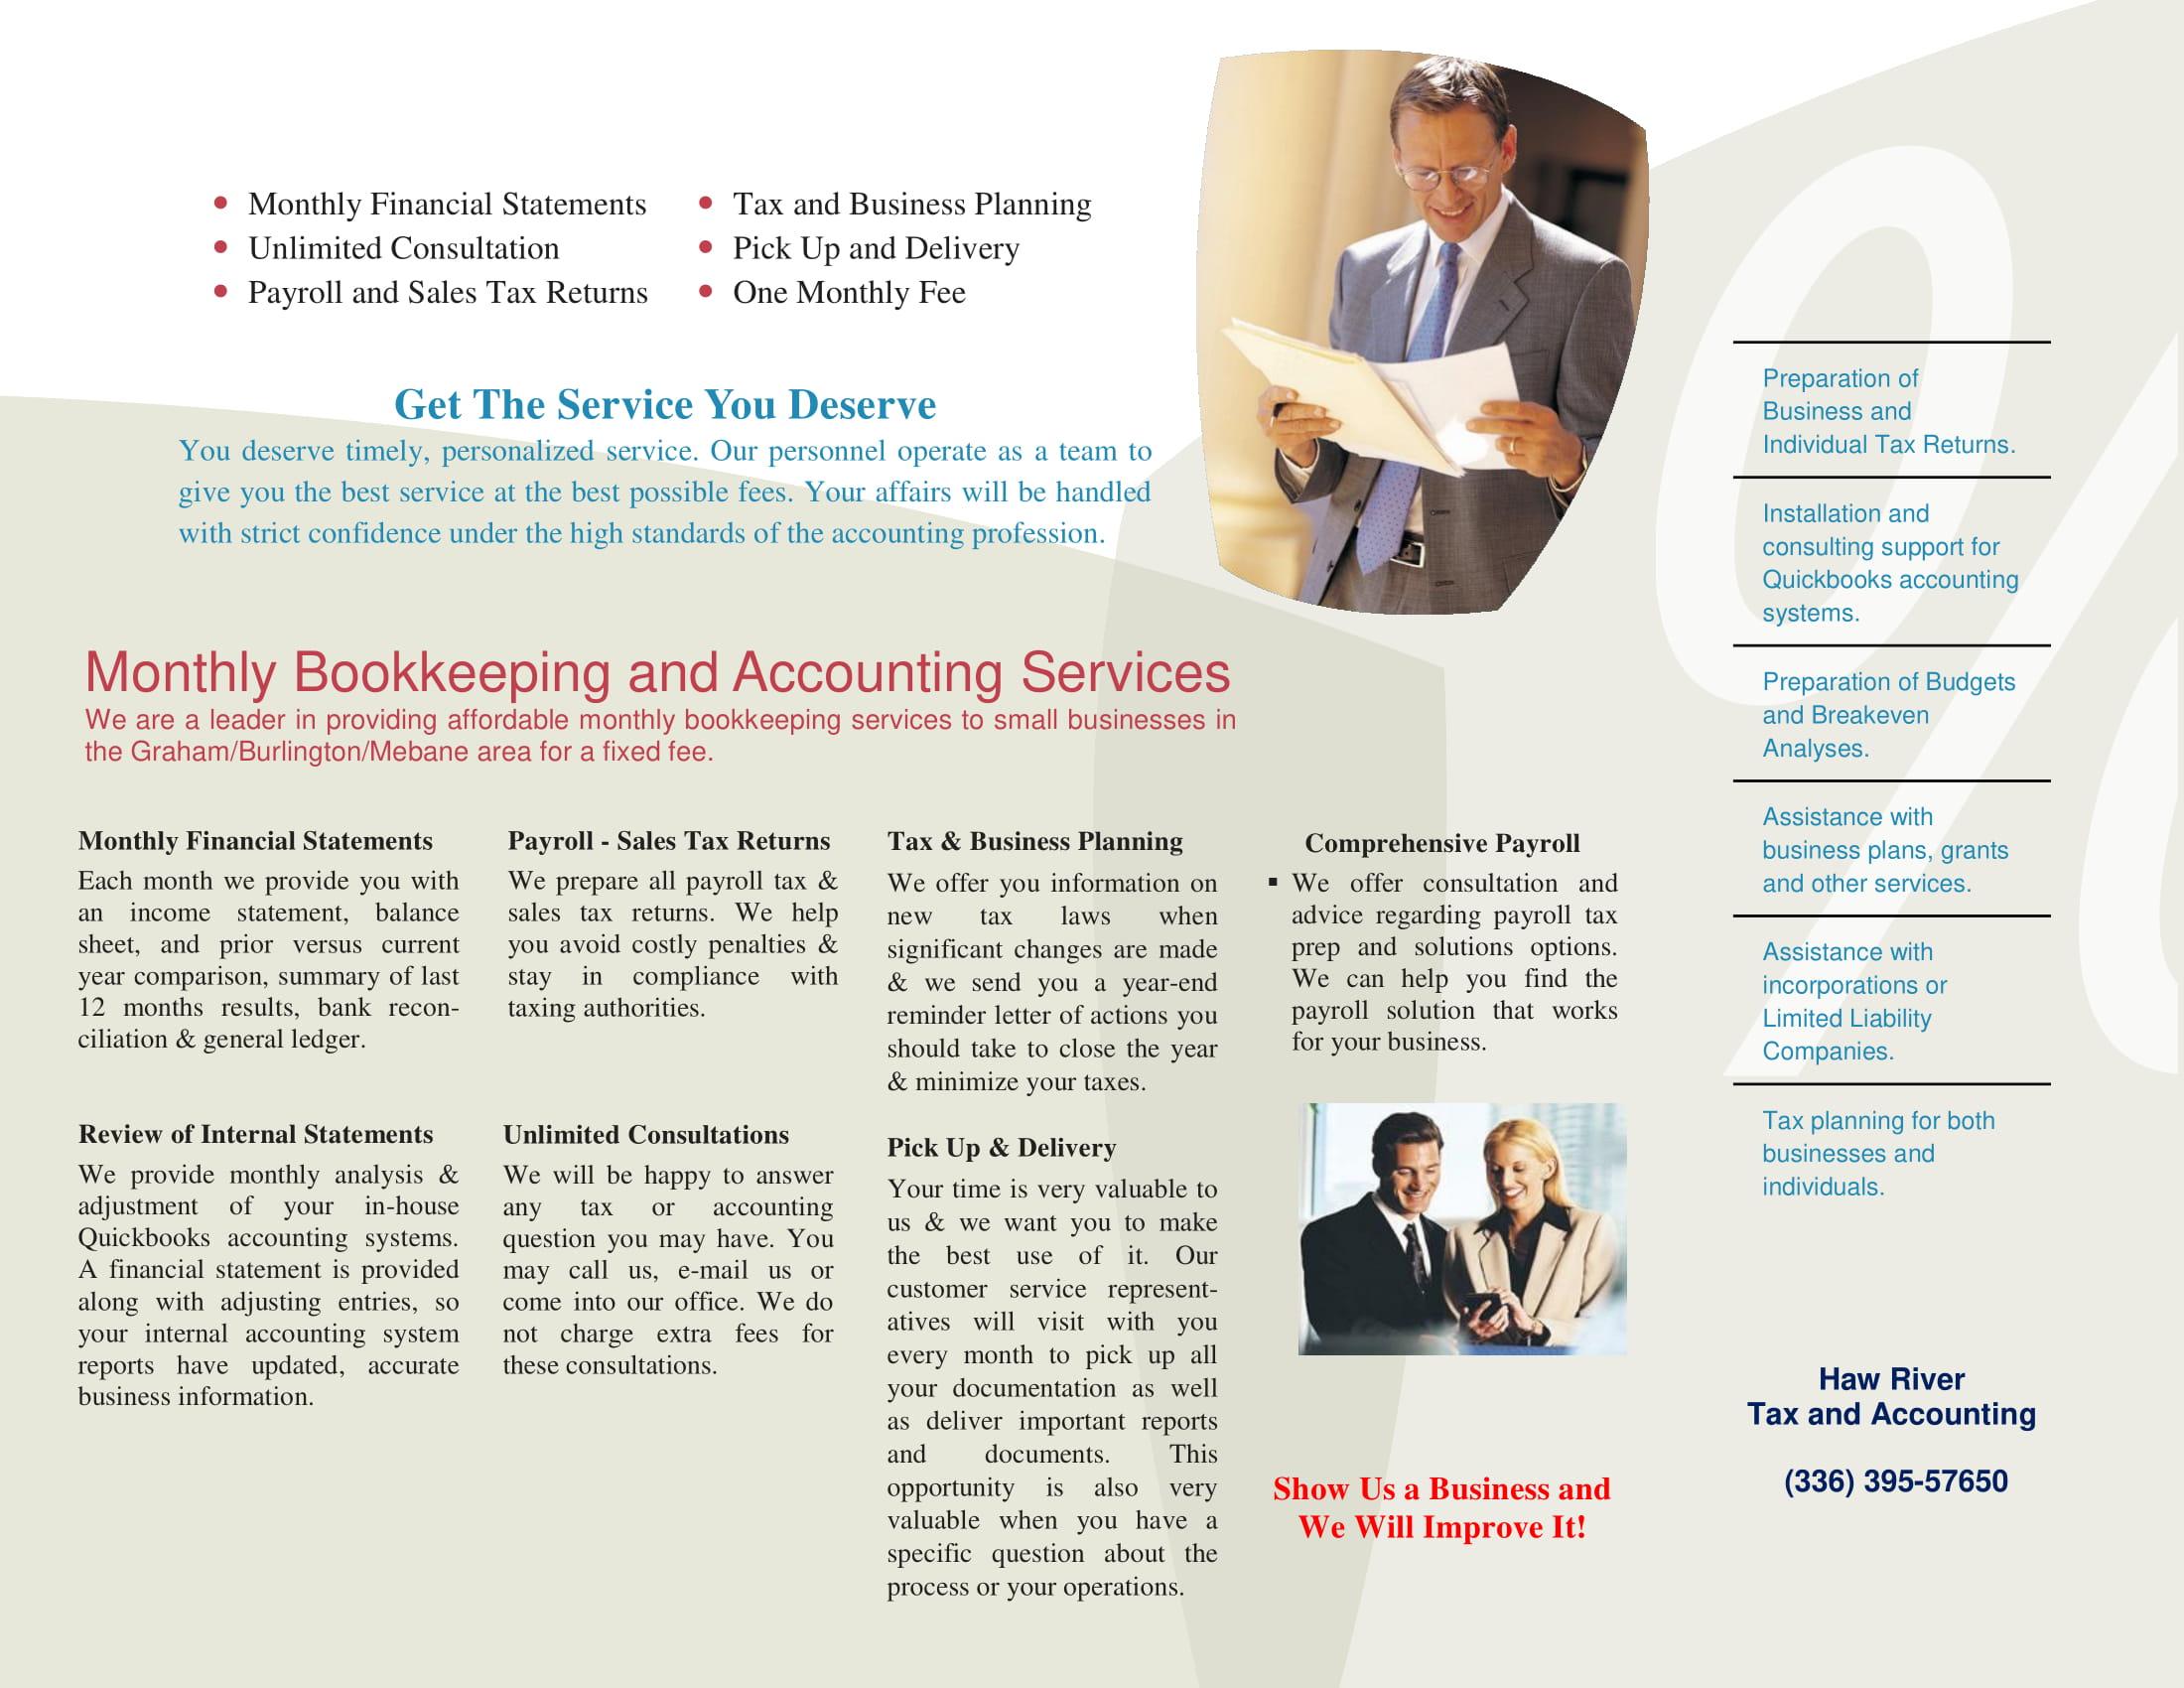 HRTA Brochure-2.jpg